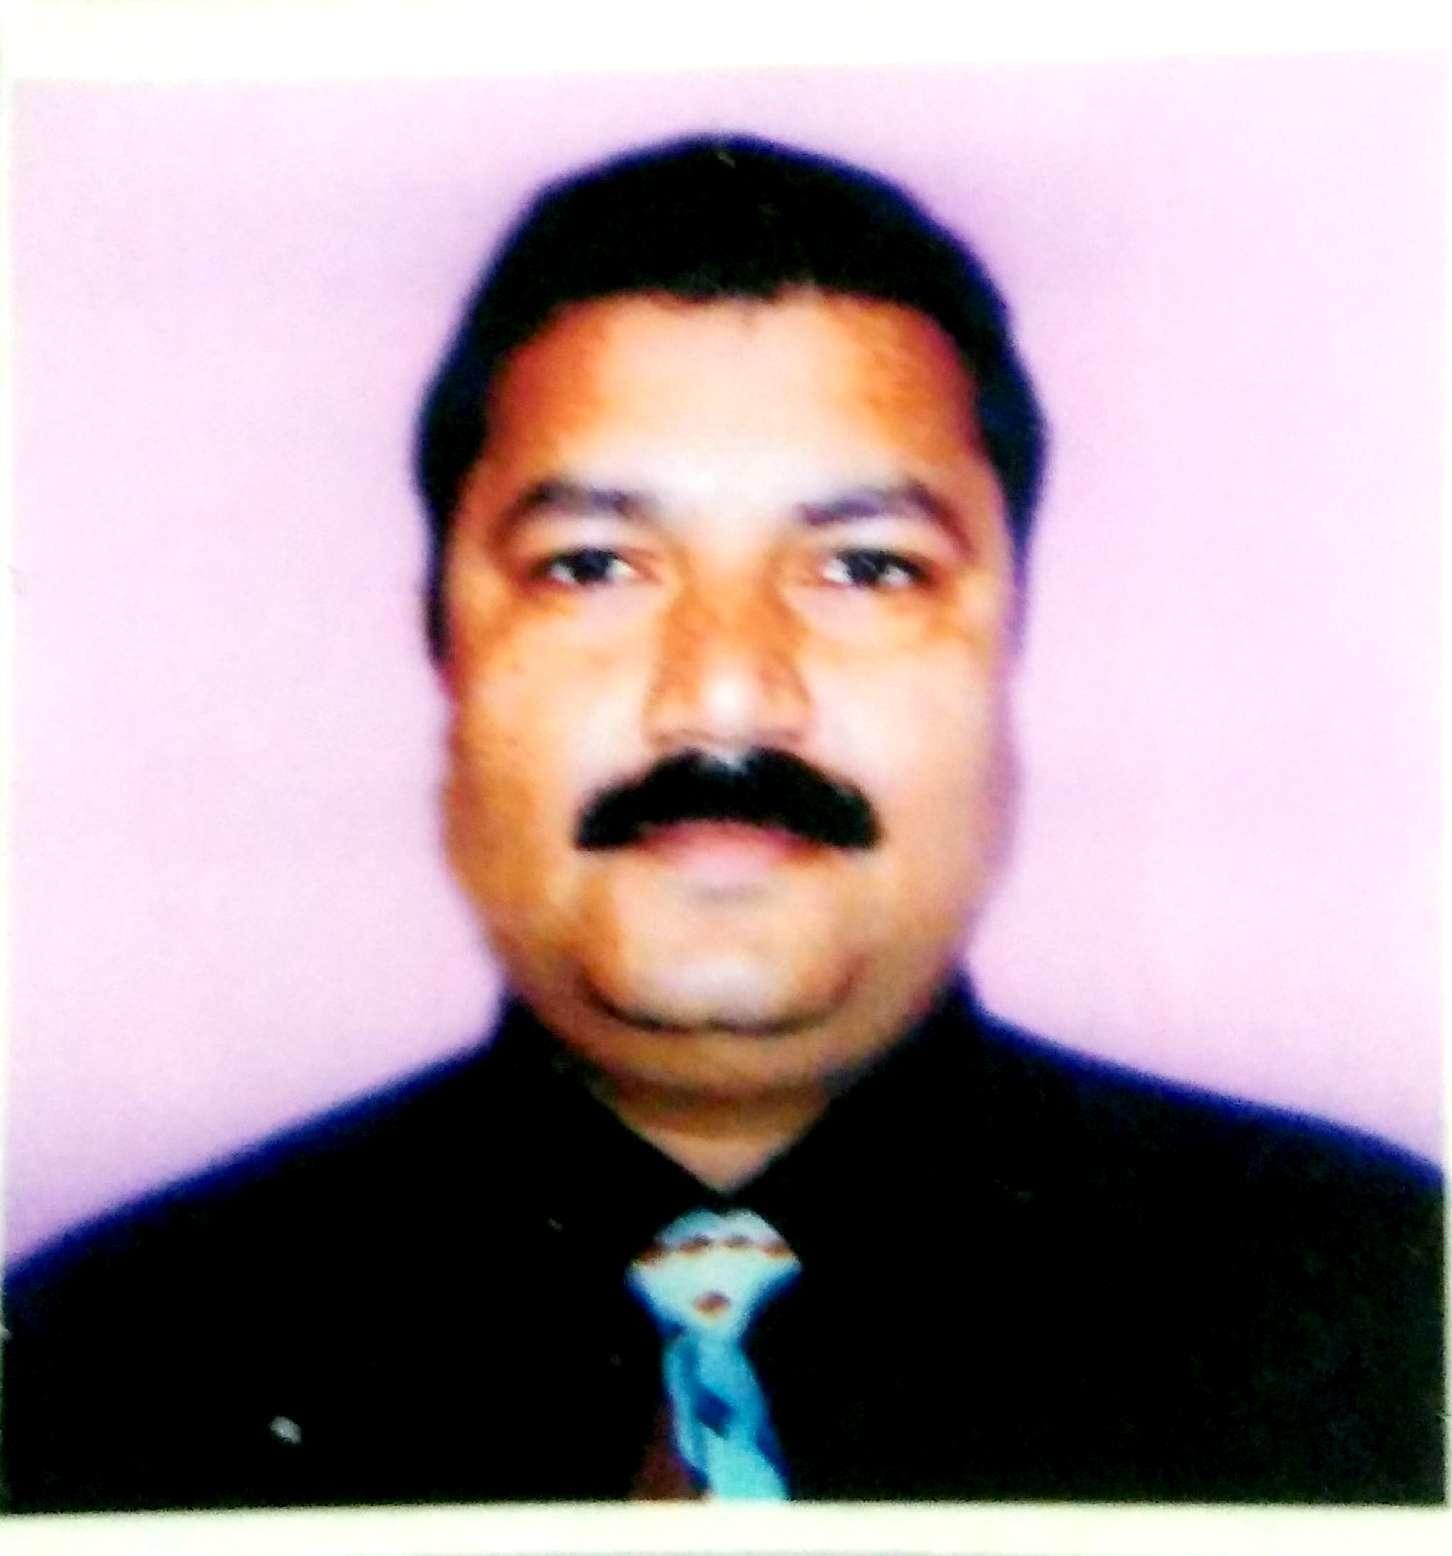 Sidheswar Mishra